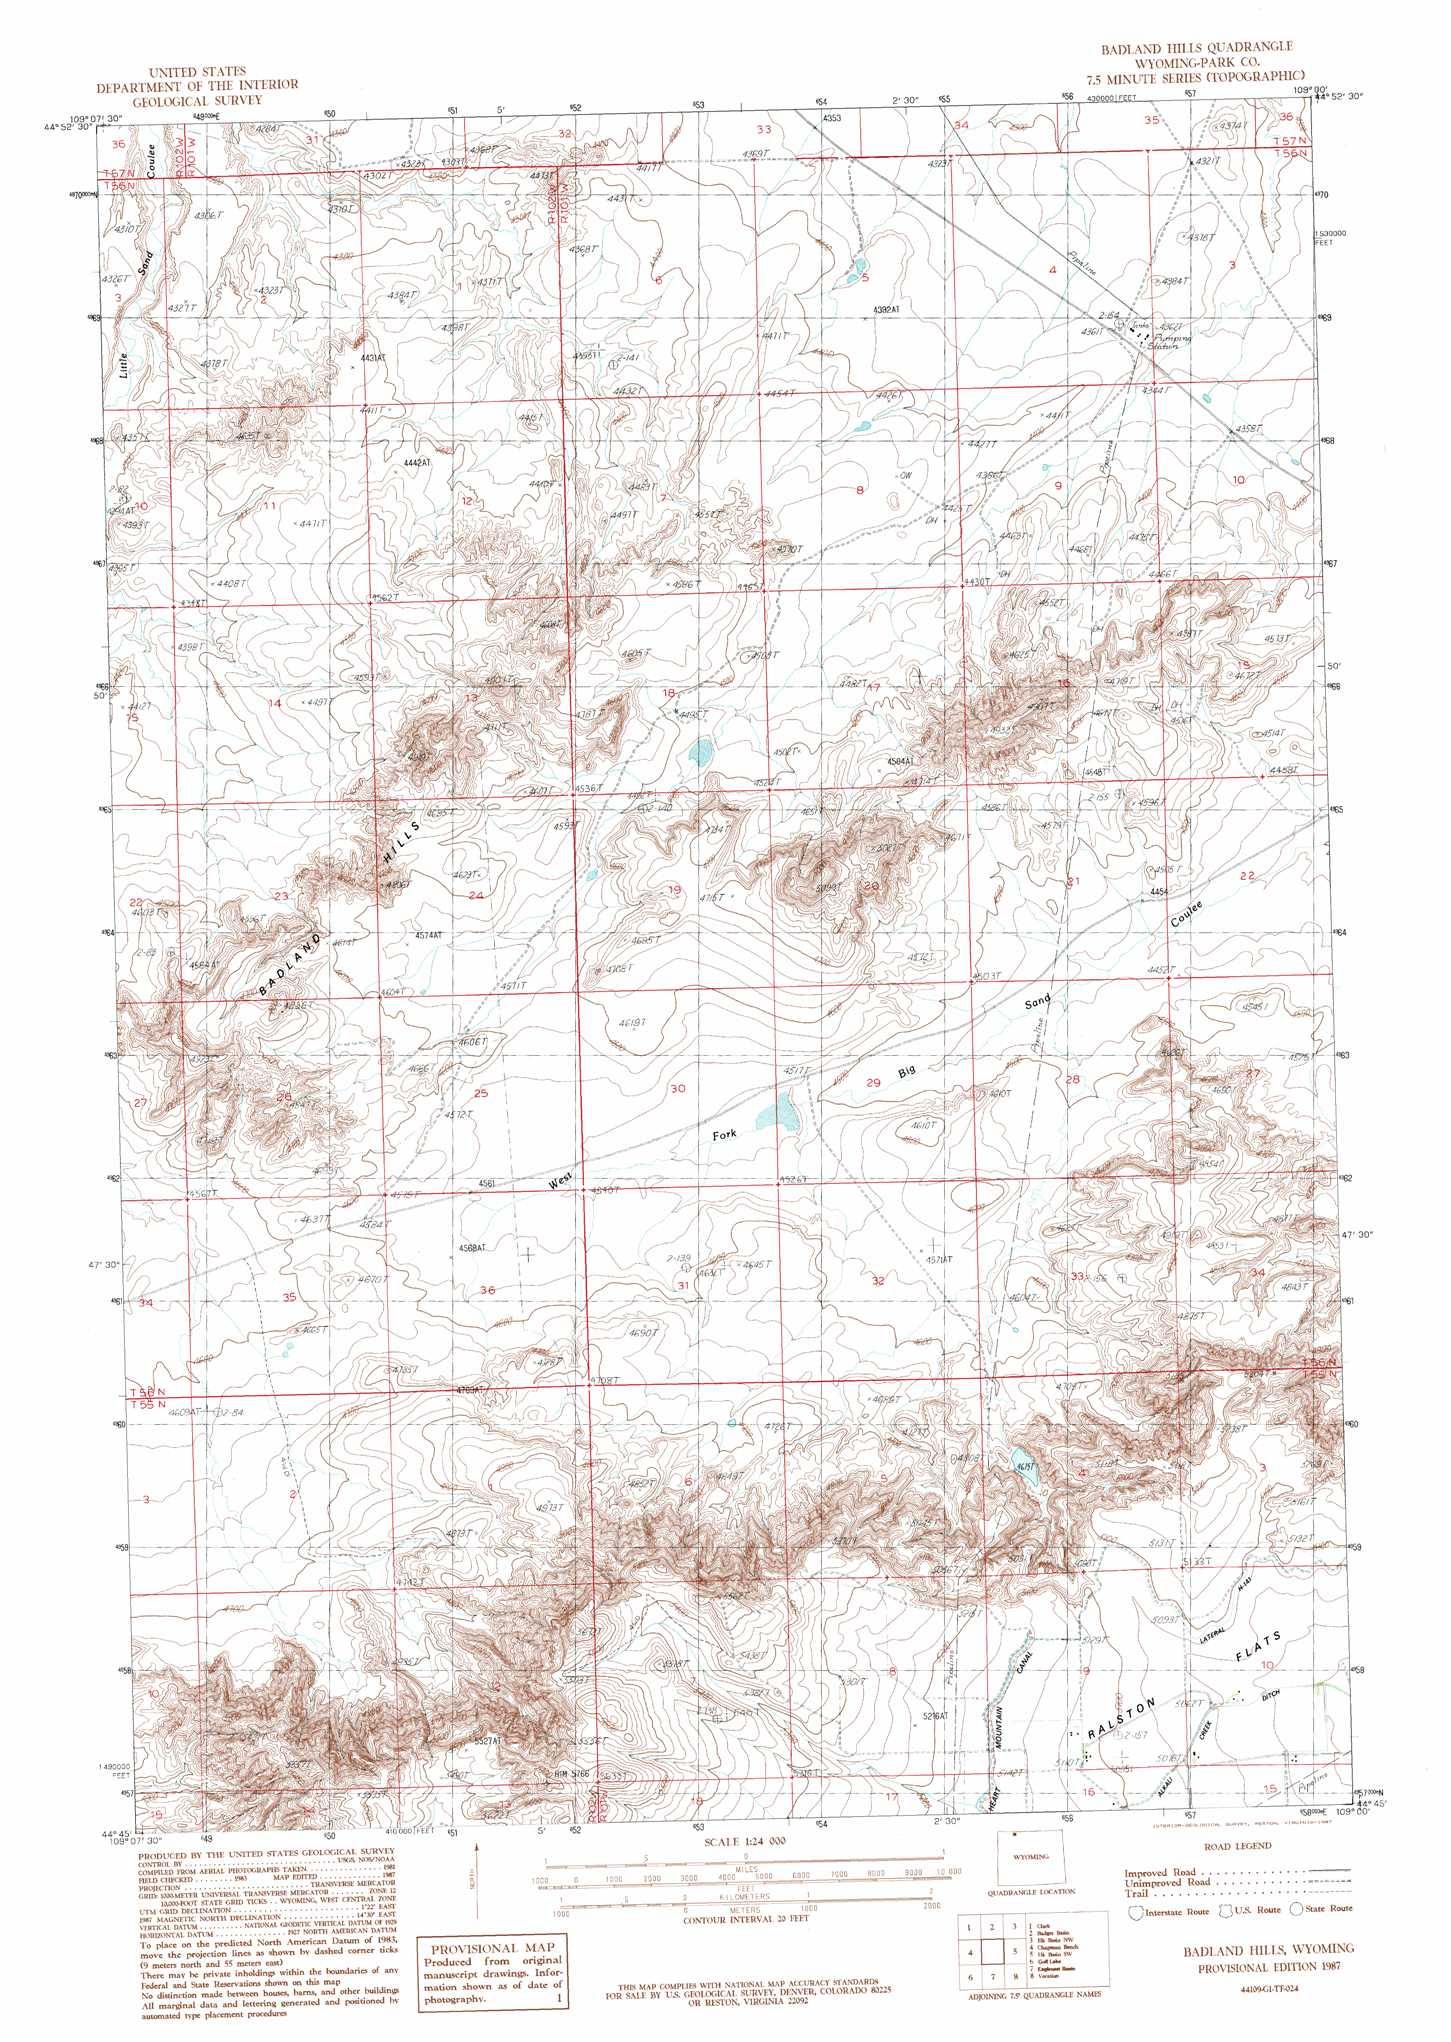 Badlands Wyoming Map.Badlands Hills Topographic Map Wy Usgs Topo Quad 44109g1